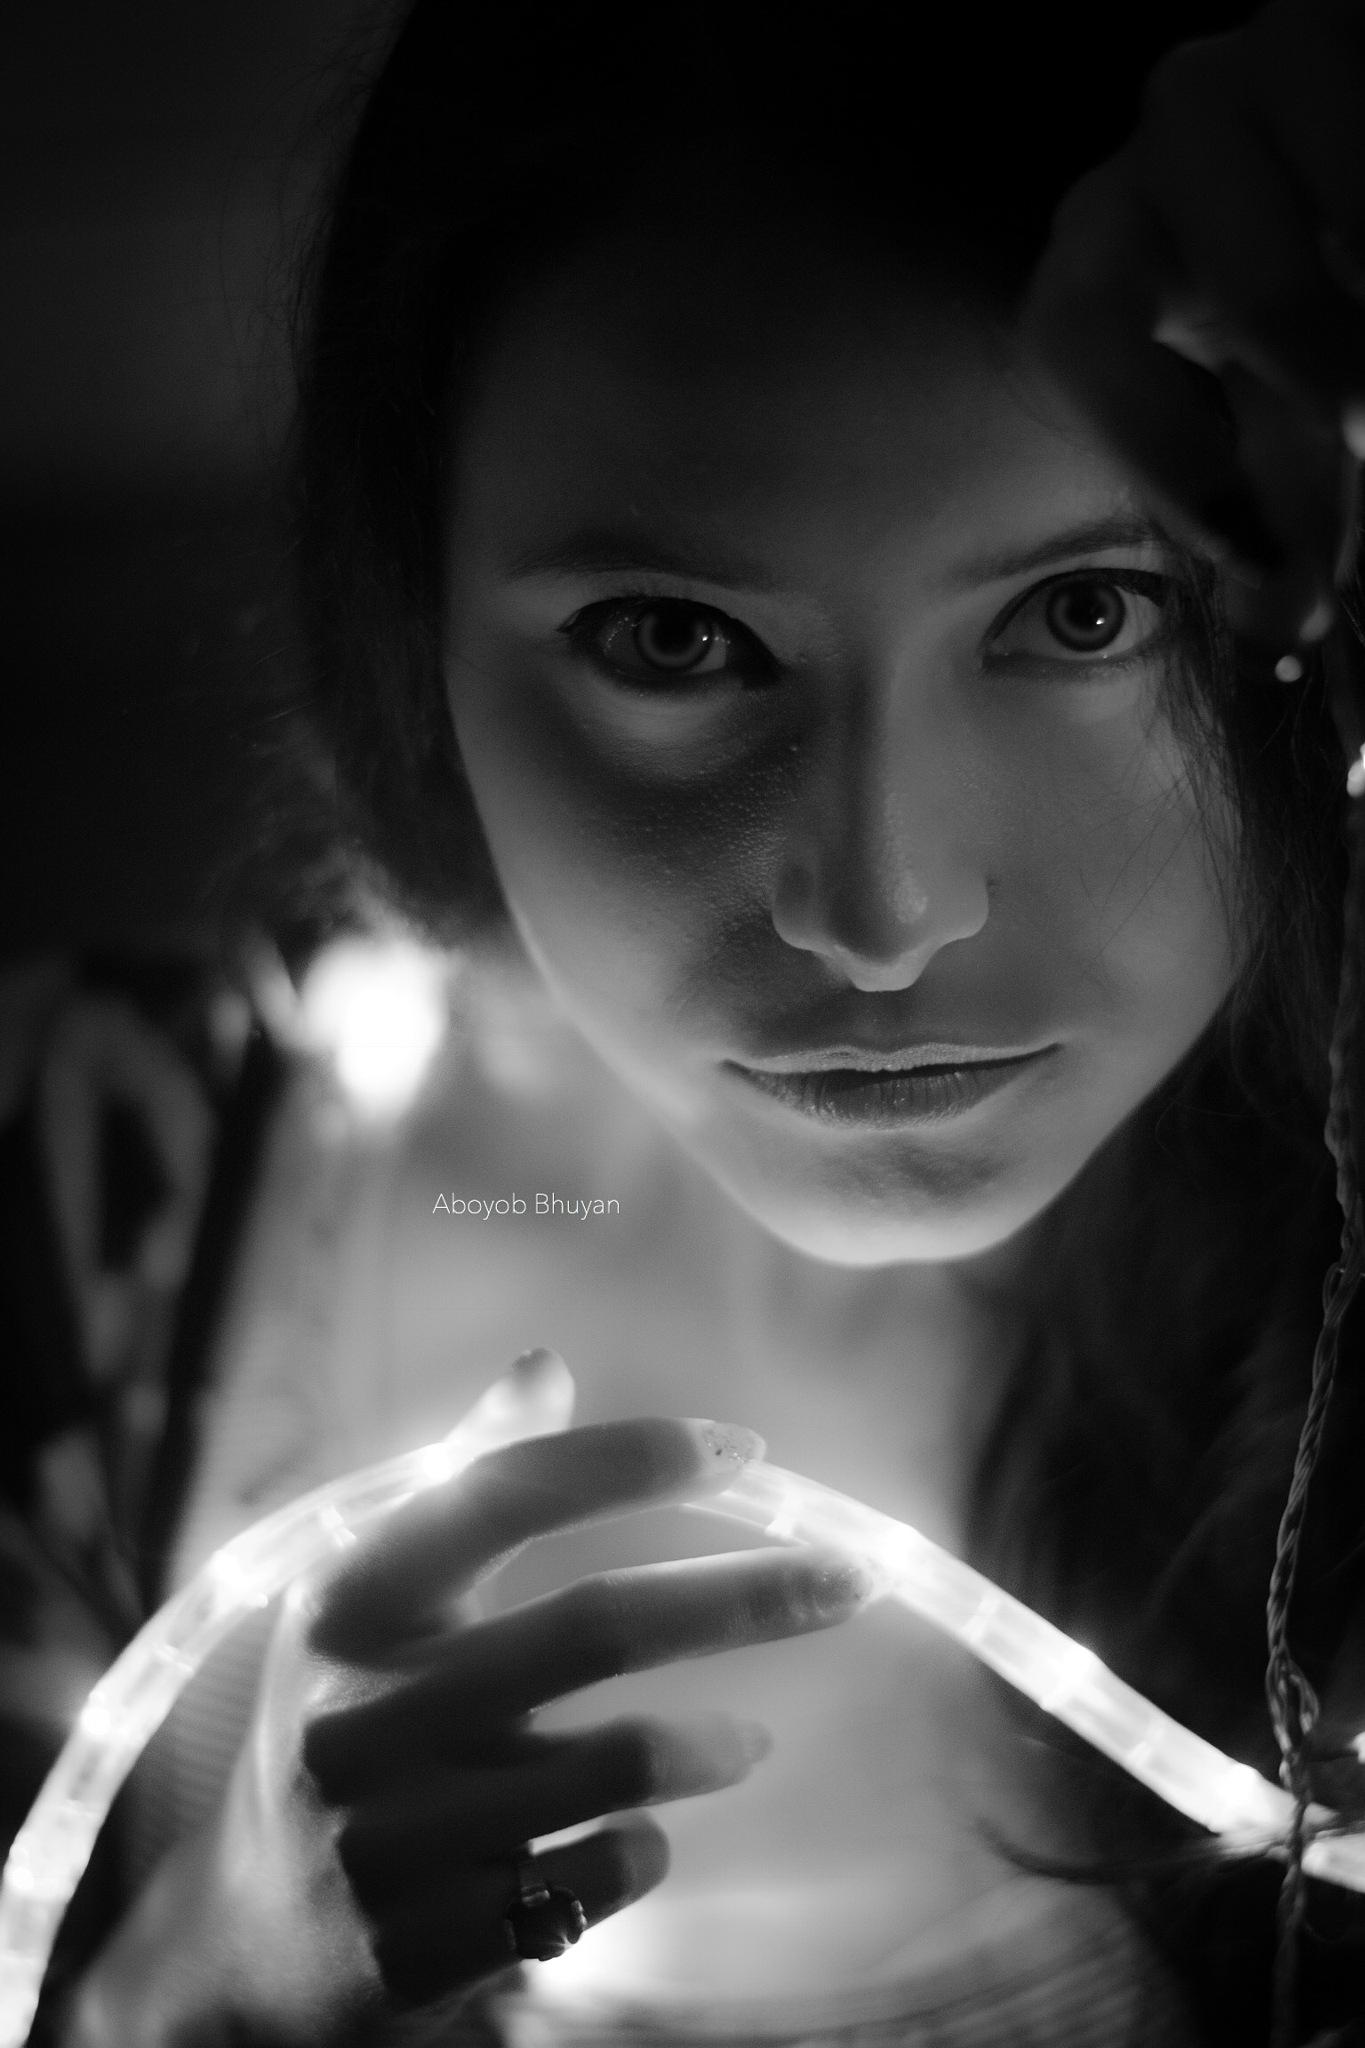 Fall in love with Eyes. by Aboyob Bhuyan